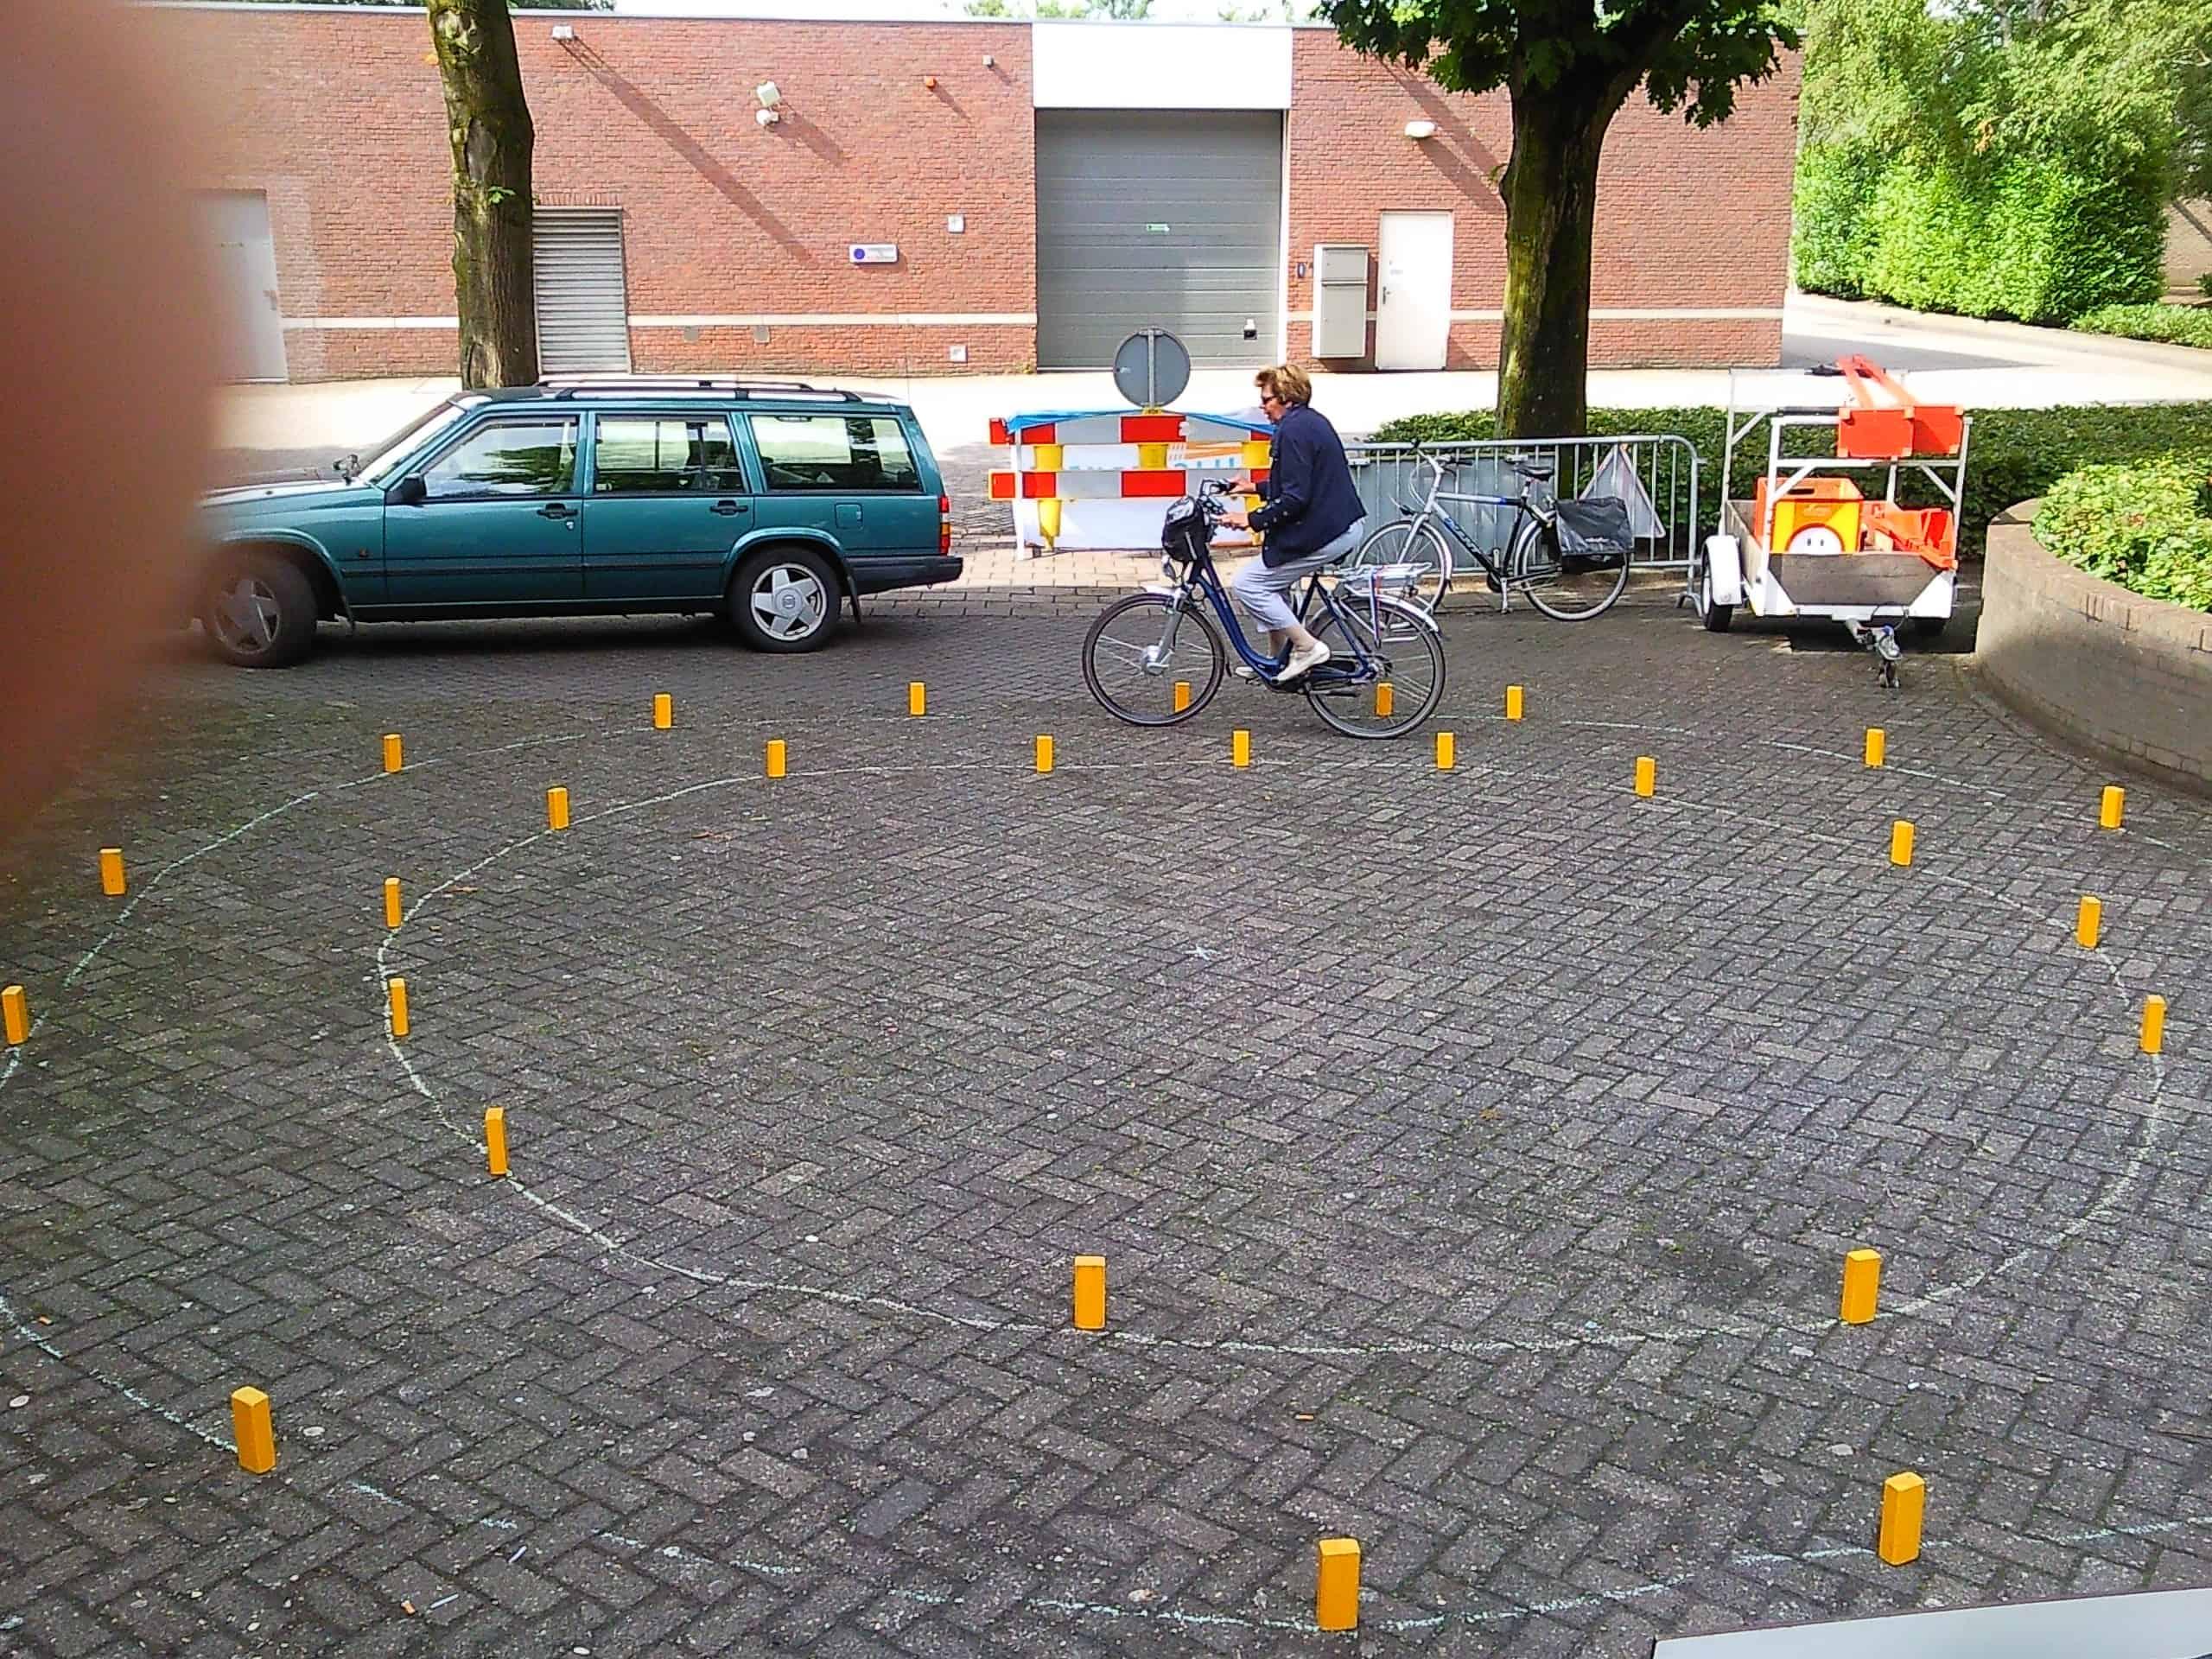 fietsvaardigheid 1